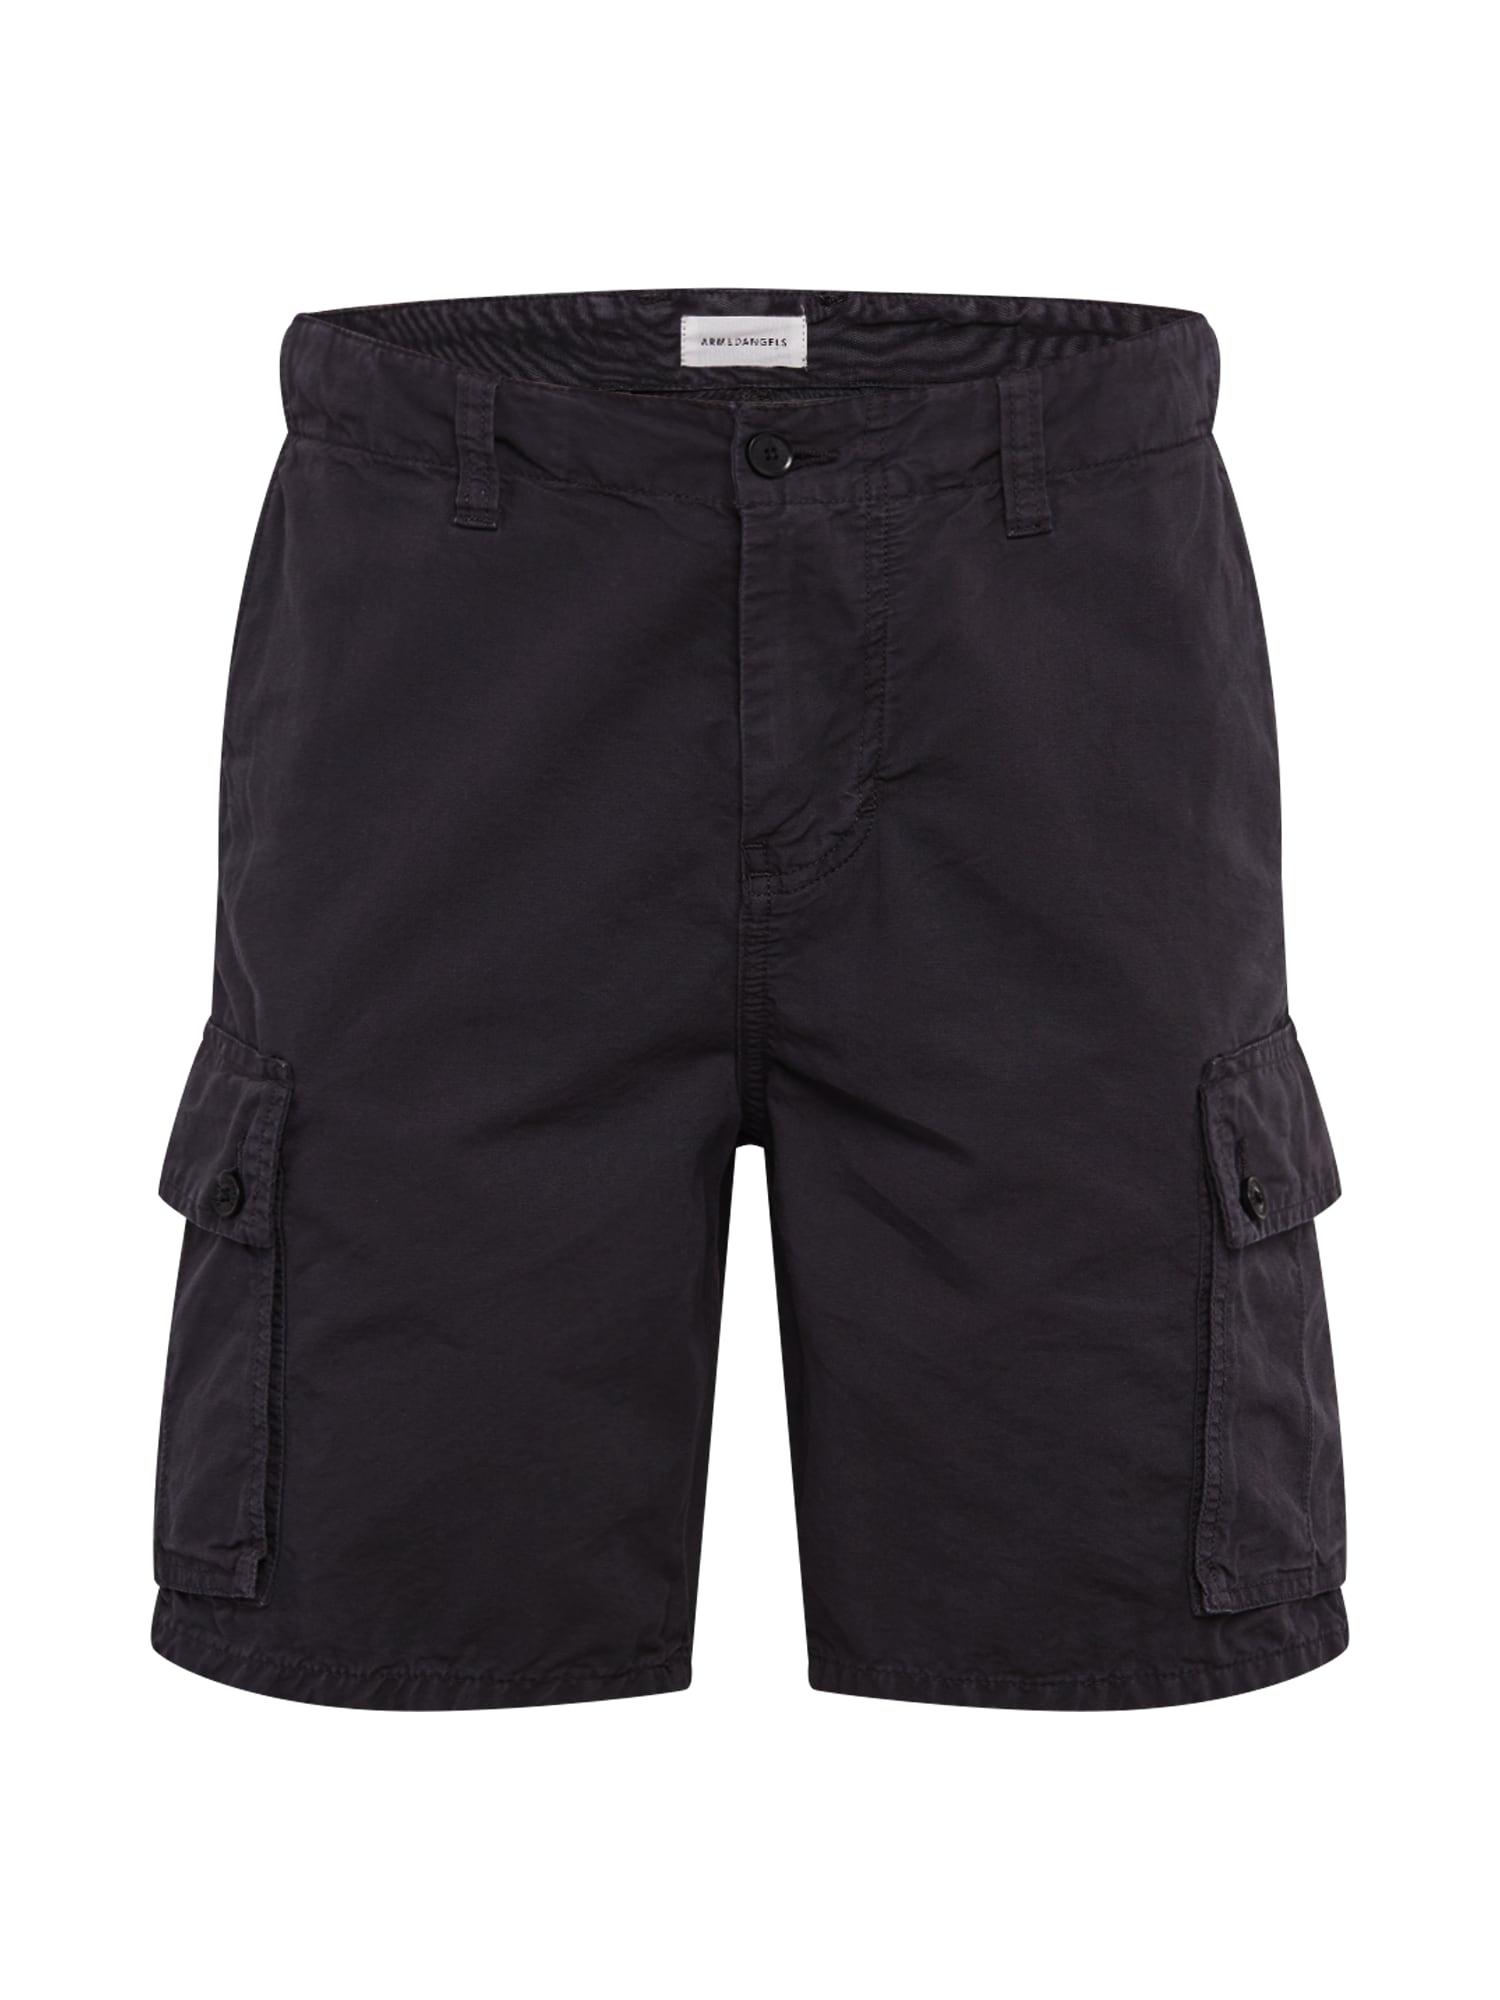 ARMEDANGELS Laisvo stiliaus kelnės 'CAARGO' juoda